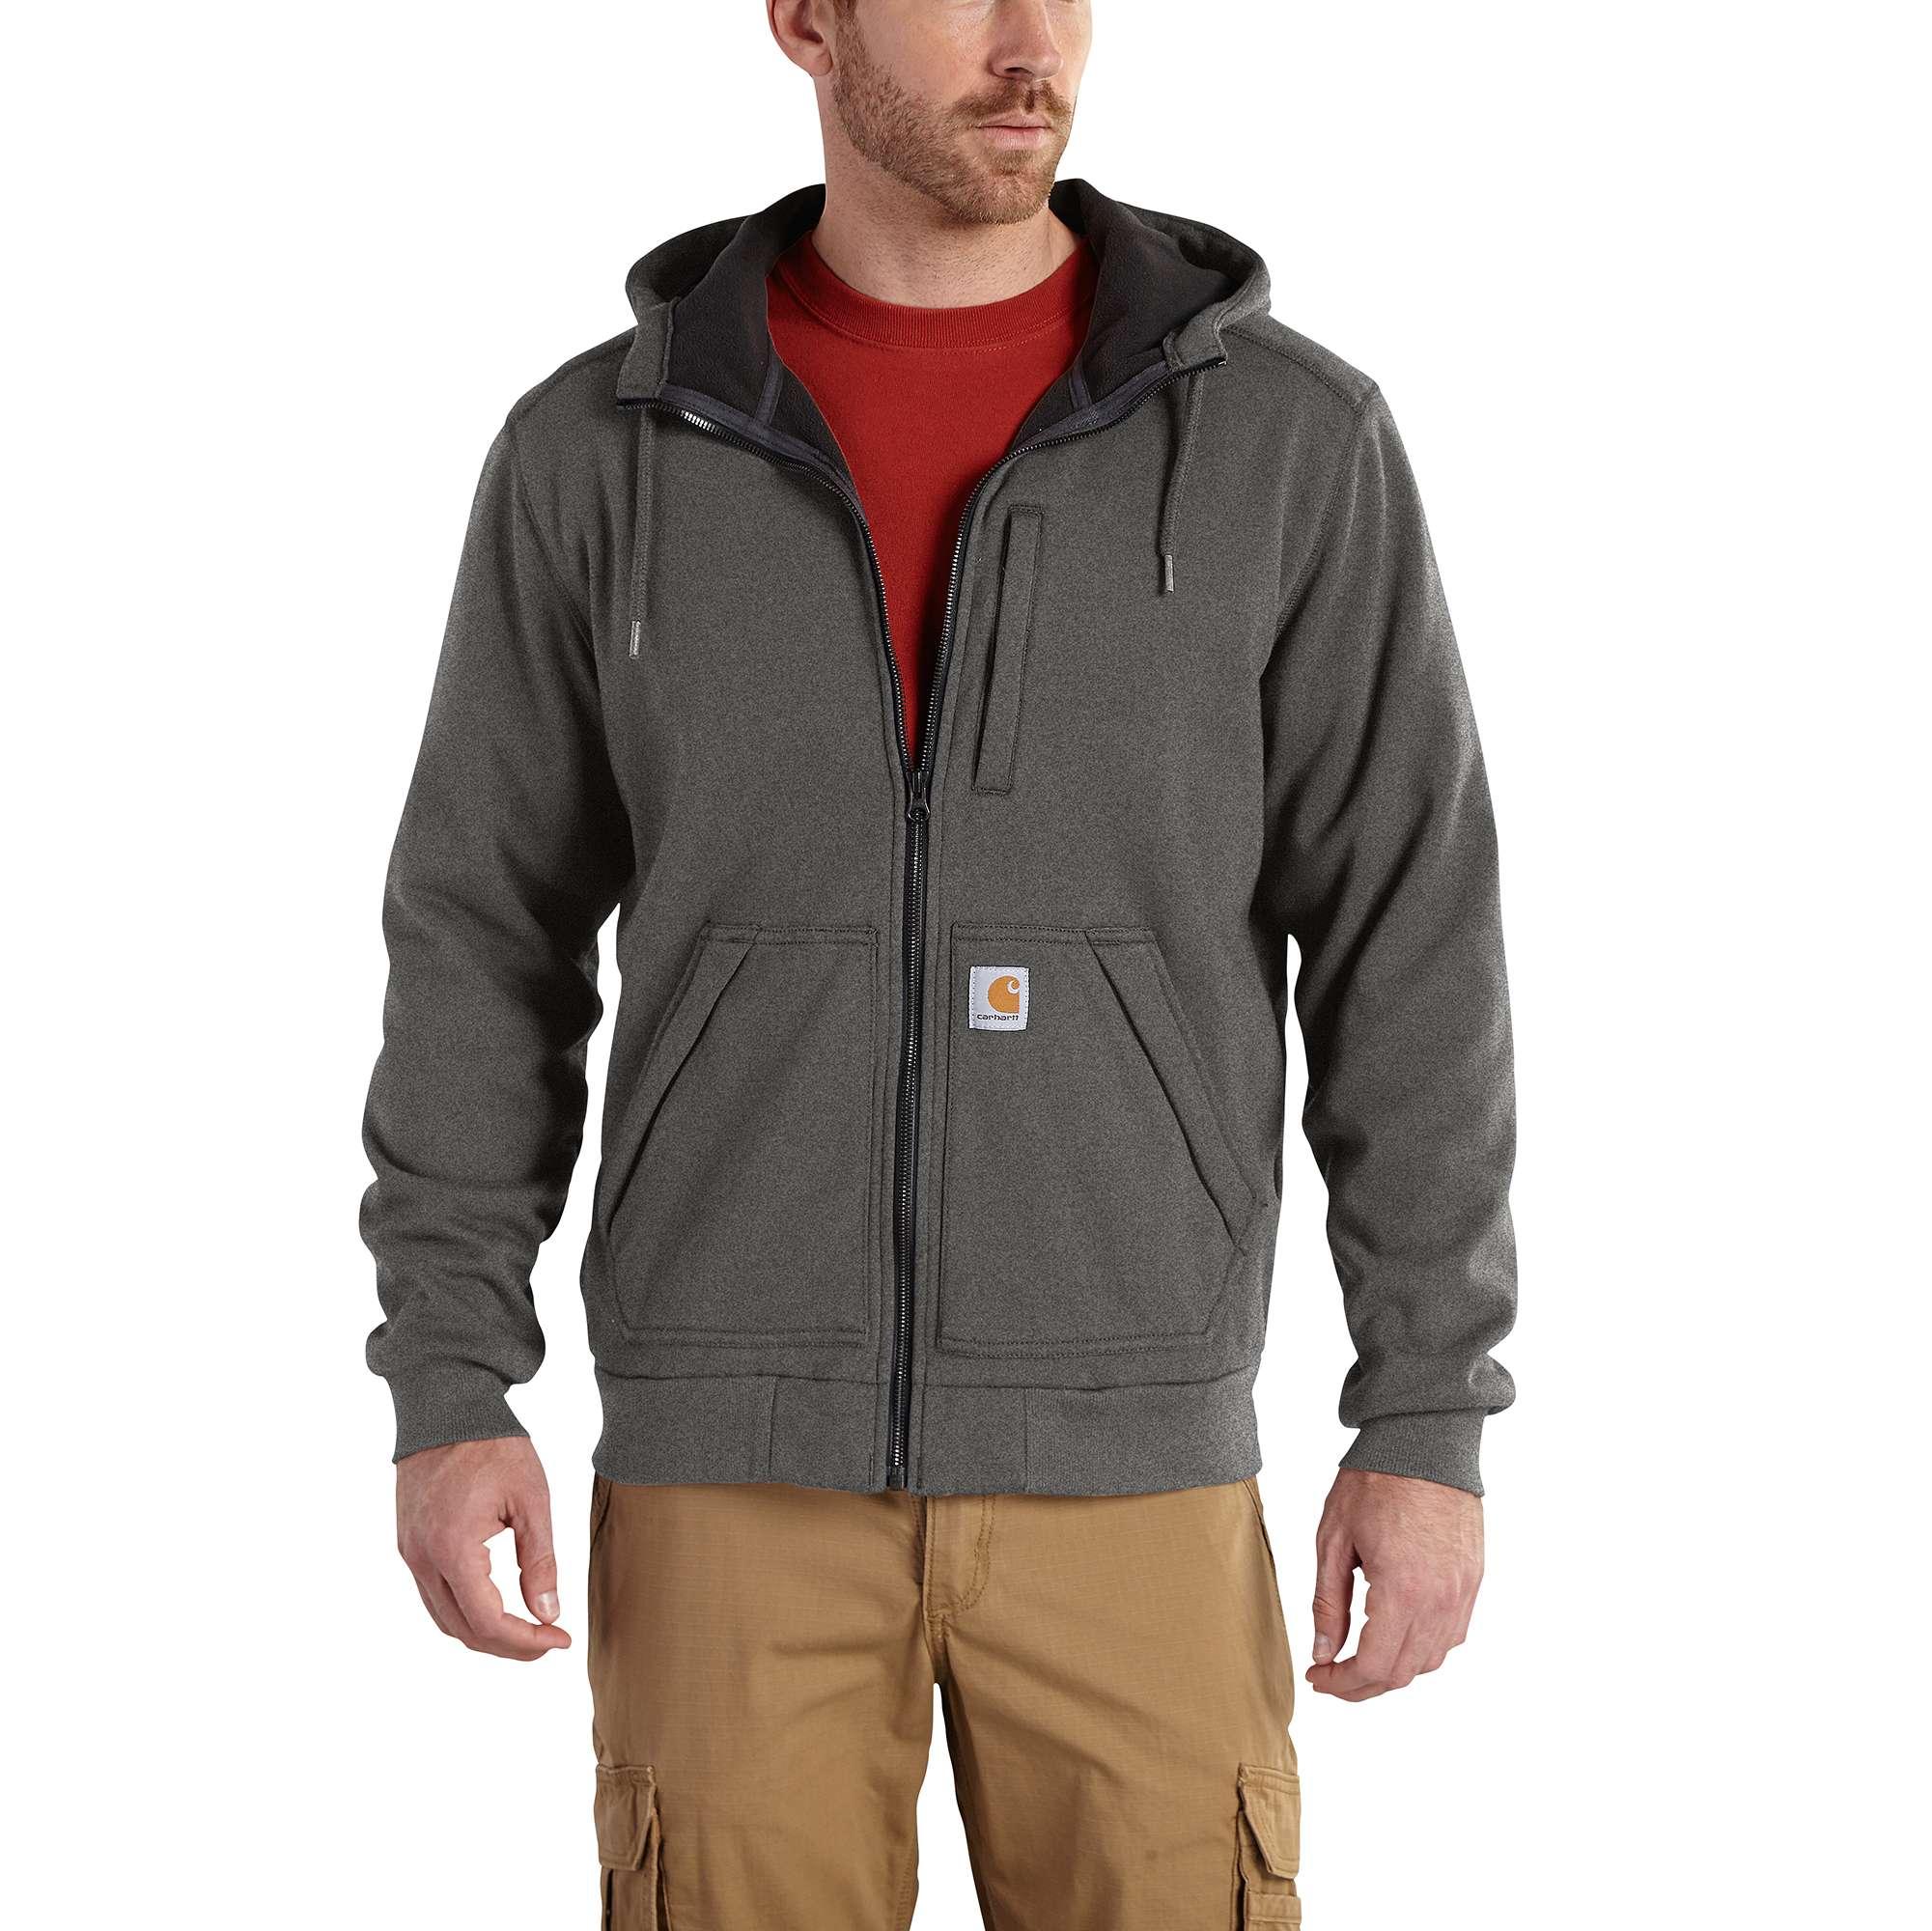 Carhartt Wind Fighter™ Sweatshirt